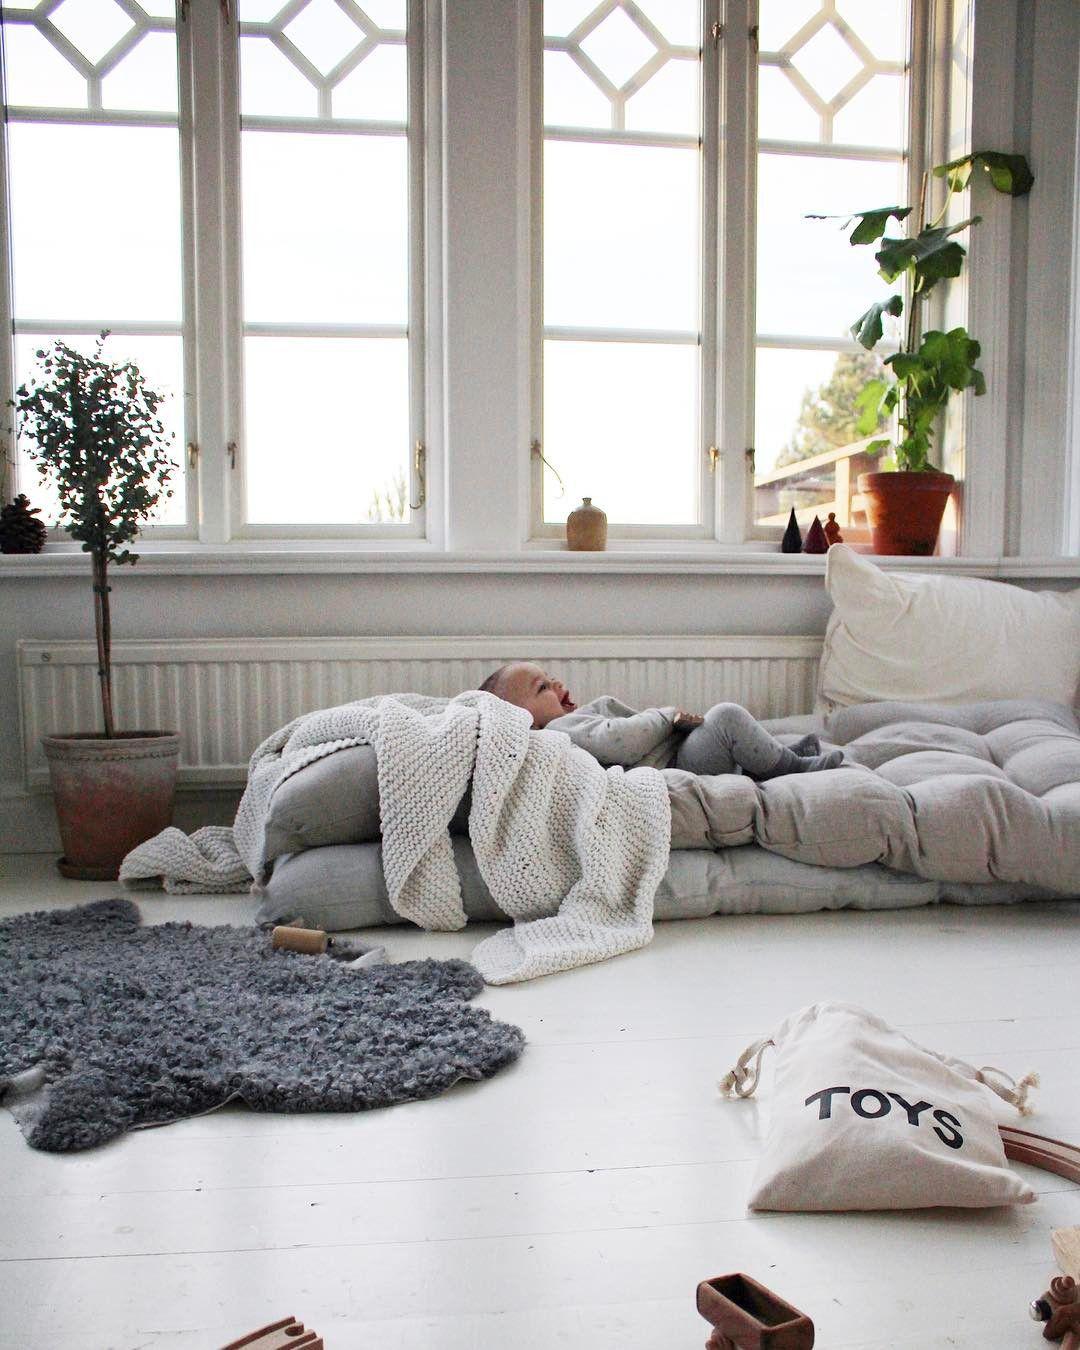 Tellkiddo 瑞典可愛圖案帆布收納袋 Toys (小)3